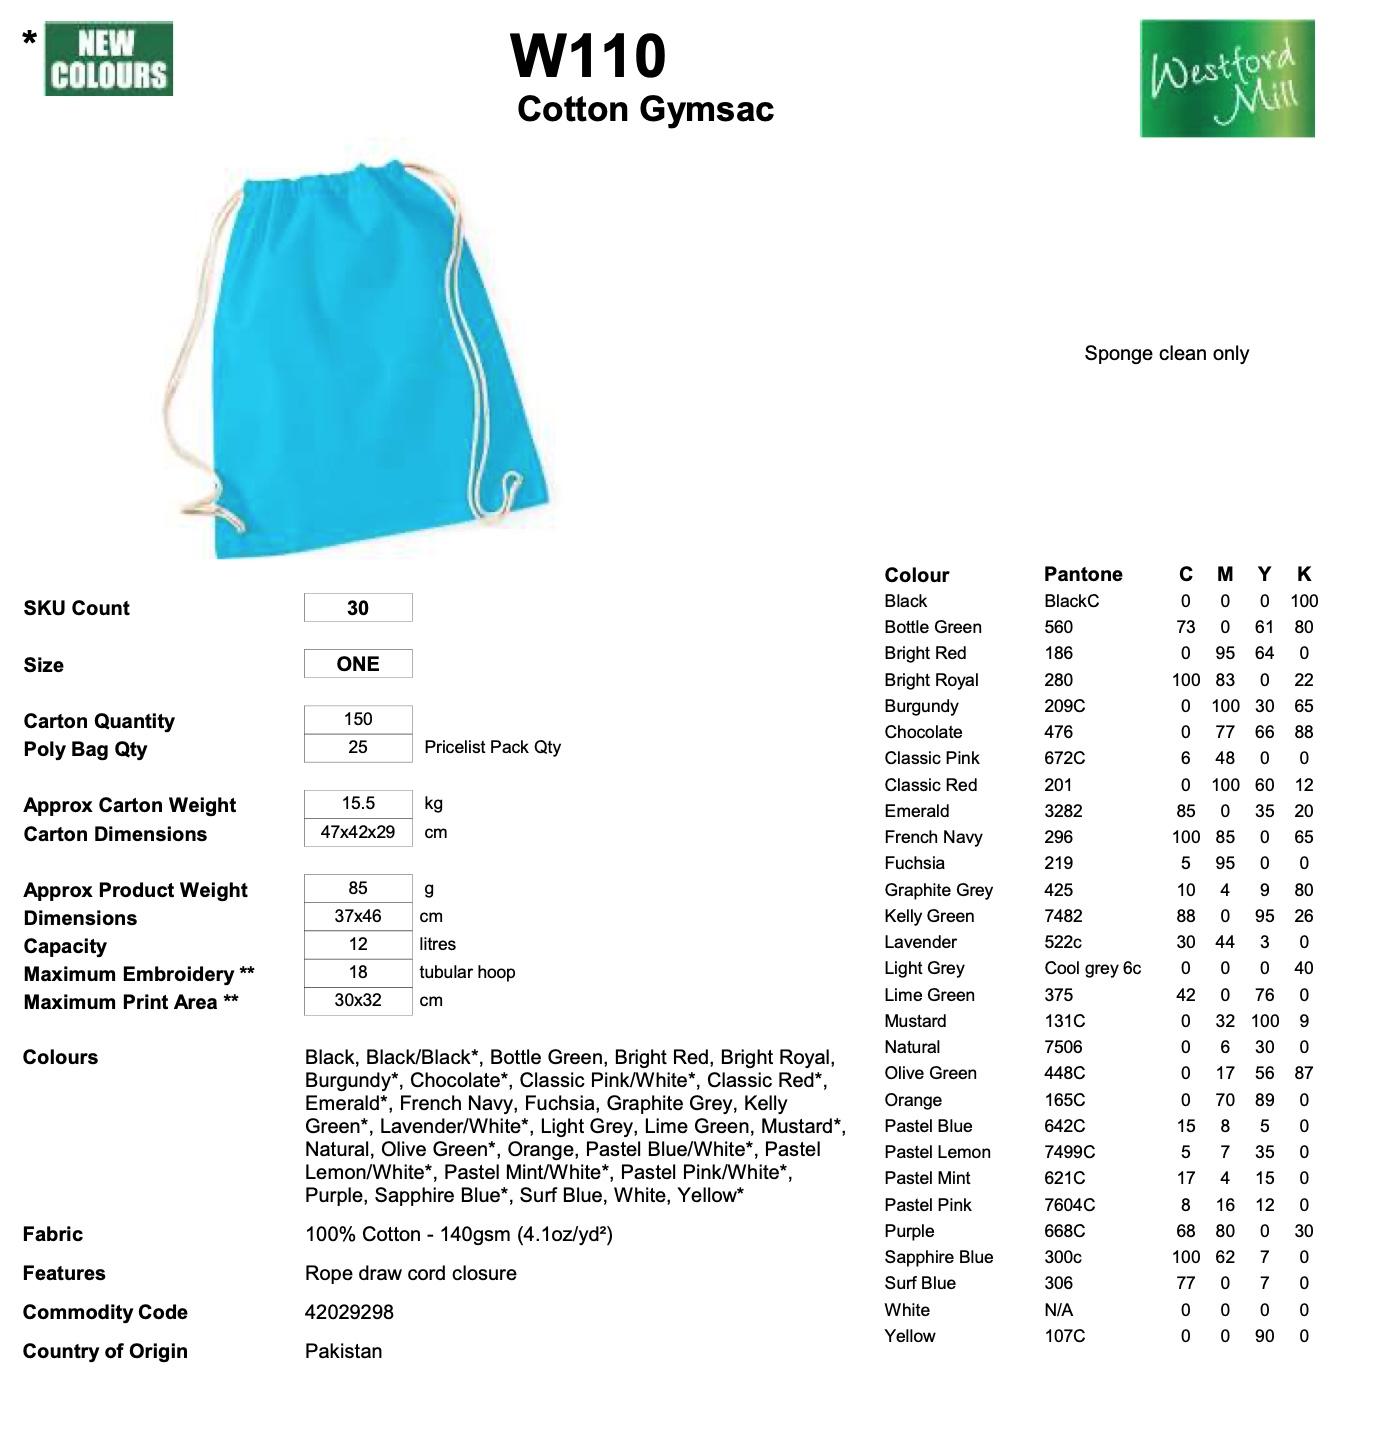 Westford Mill: Cotton Gymsac W110